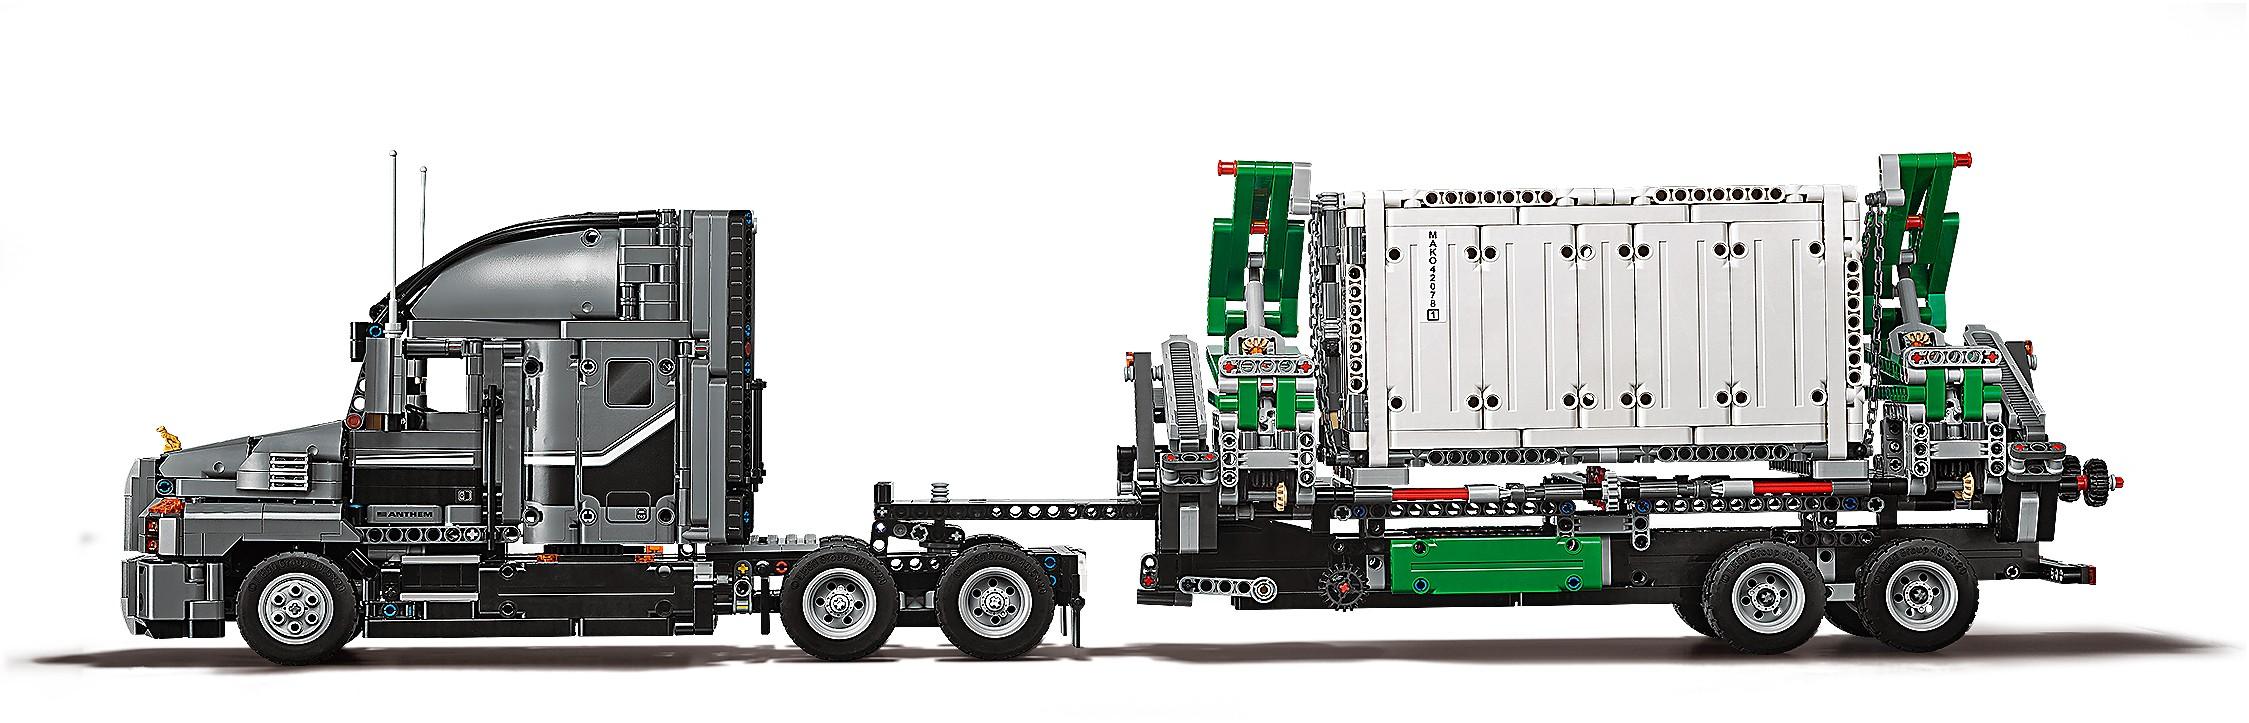 Lego Technic 2018 Sets >> LEGO Technic 2018: Mack Truck 42078 vorgestellt | zusammengebaut